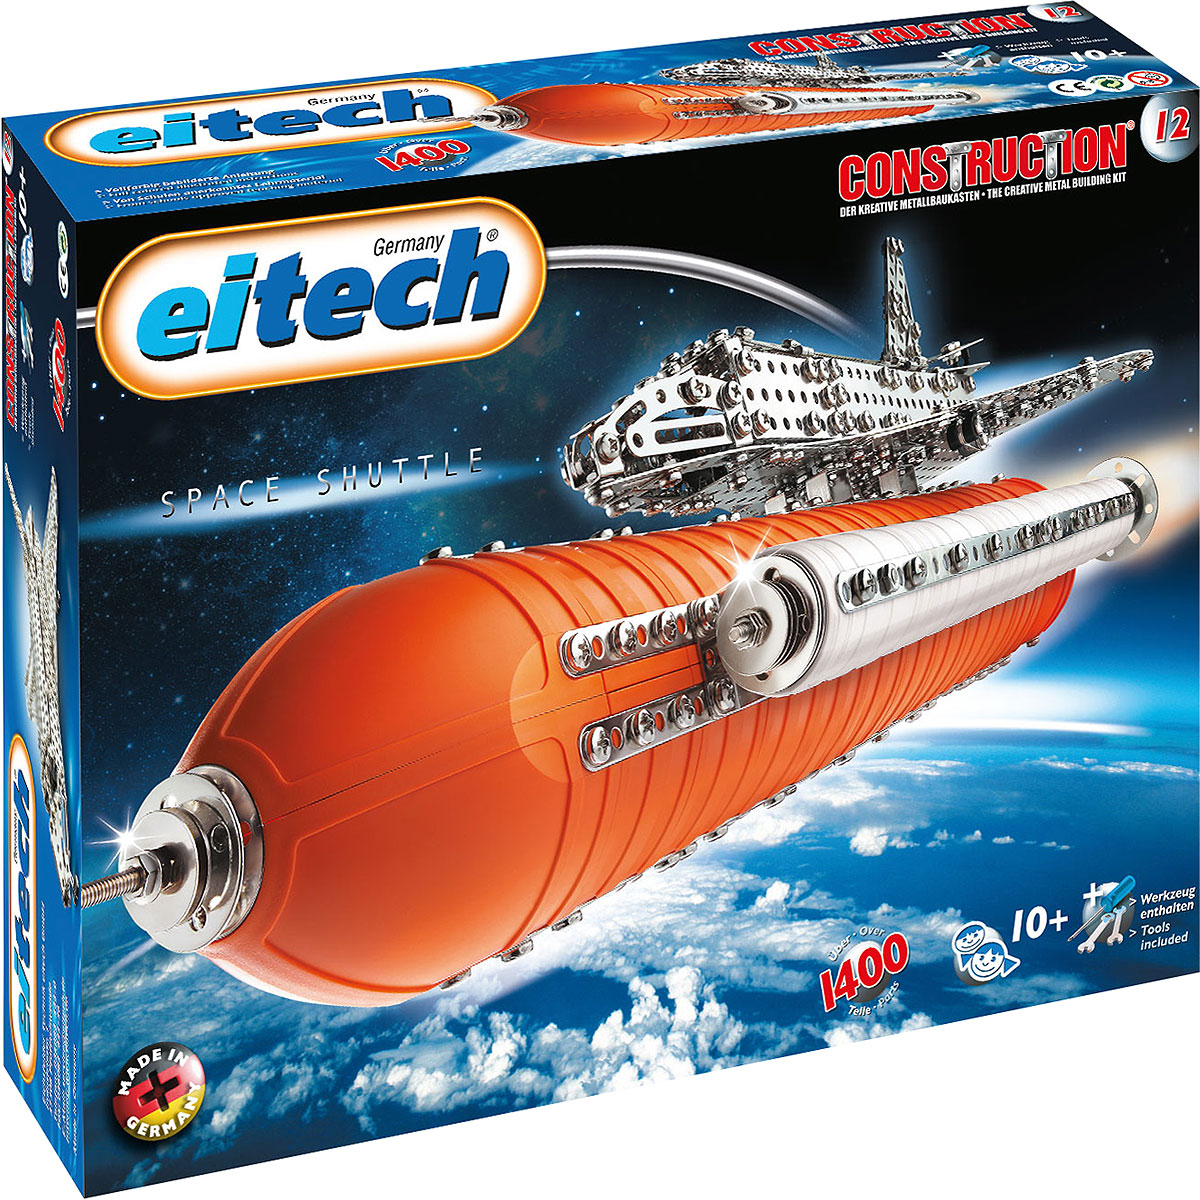 Eitech Конструктор Космический шатл конструкторы eitech конструктор меxаник 250 деталей